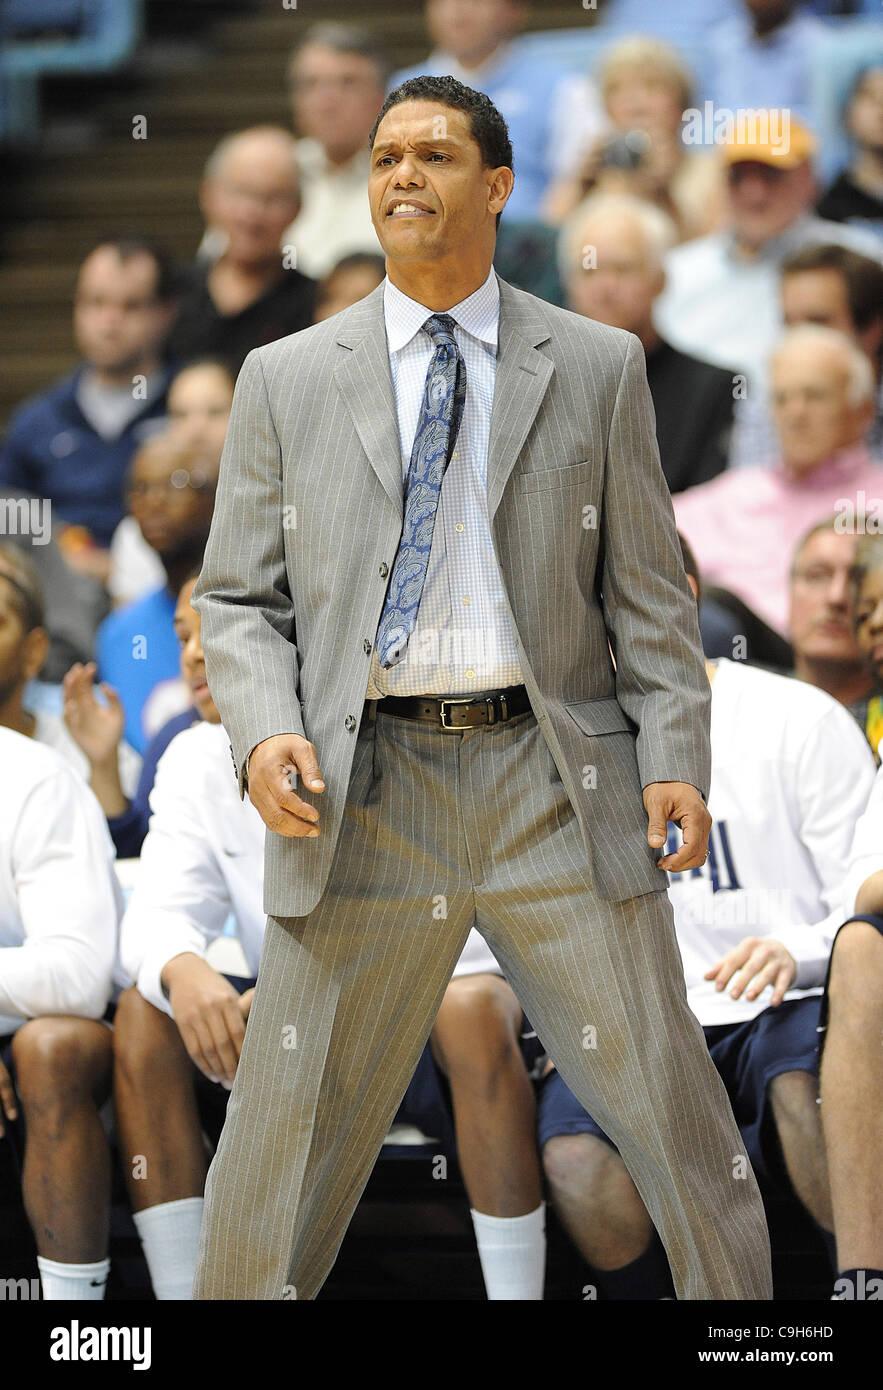 Jan. 01, 2012 - Chapel Hill, North Carolina; USA -  Monmouth Hawks Head Coach and Former Carolina Tarheel KING RICE - Stock Image